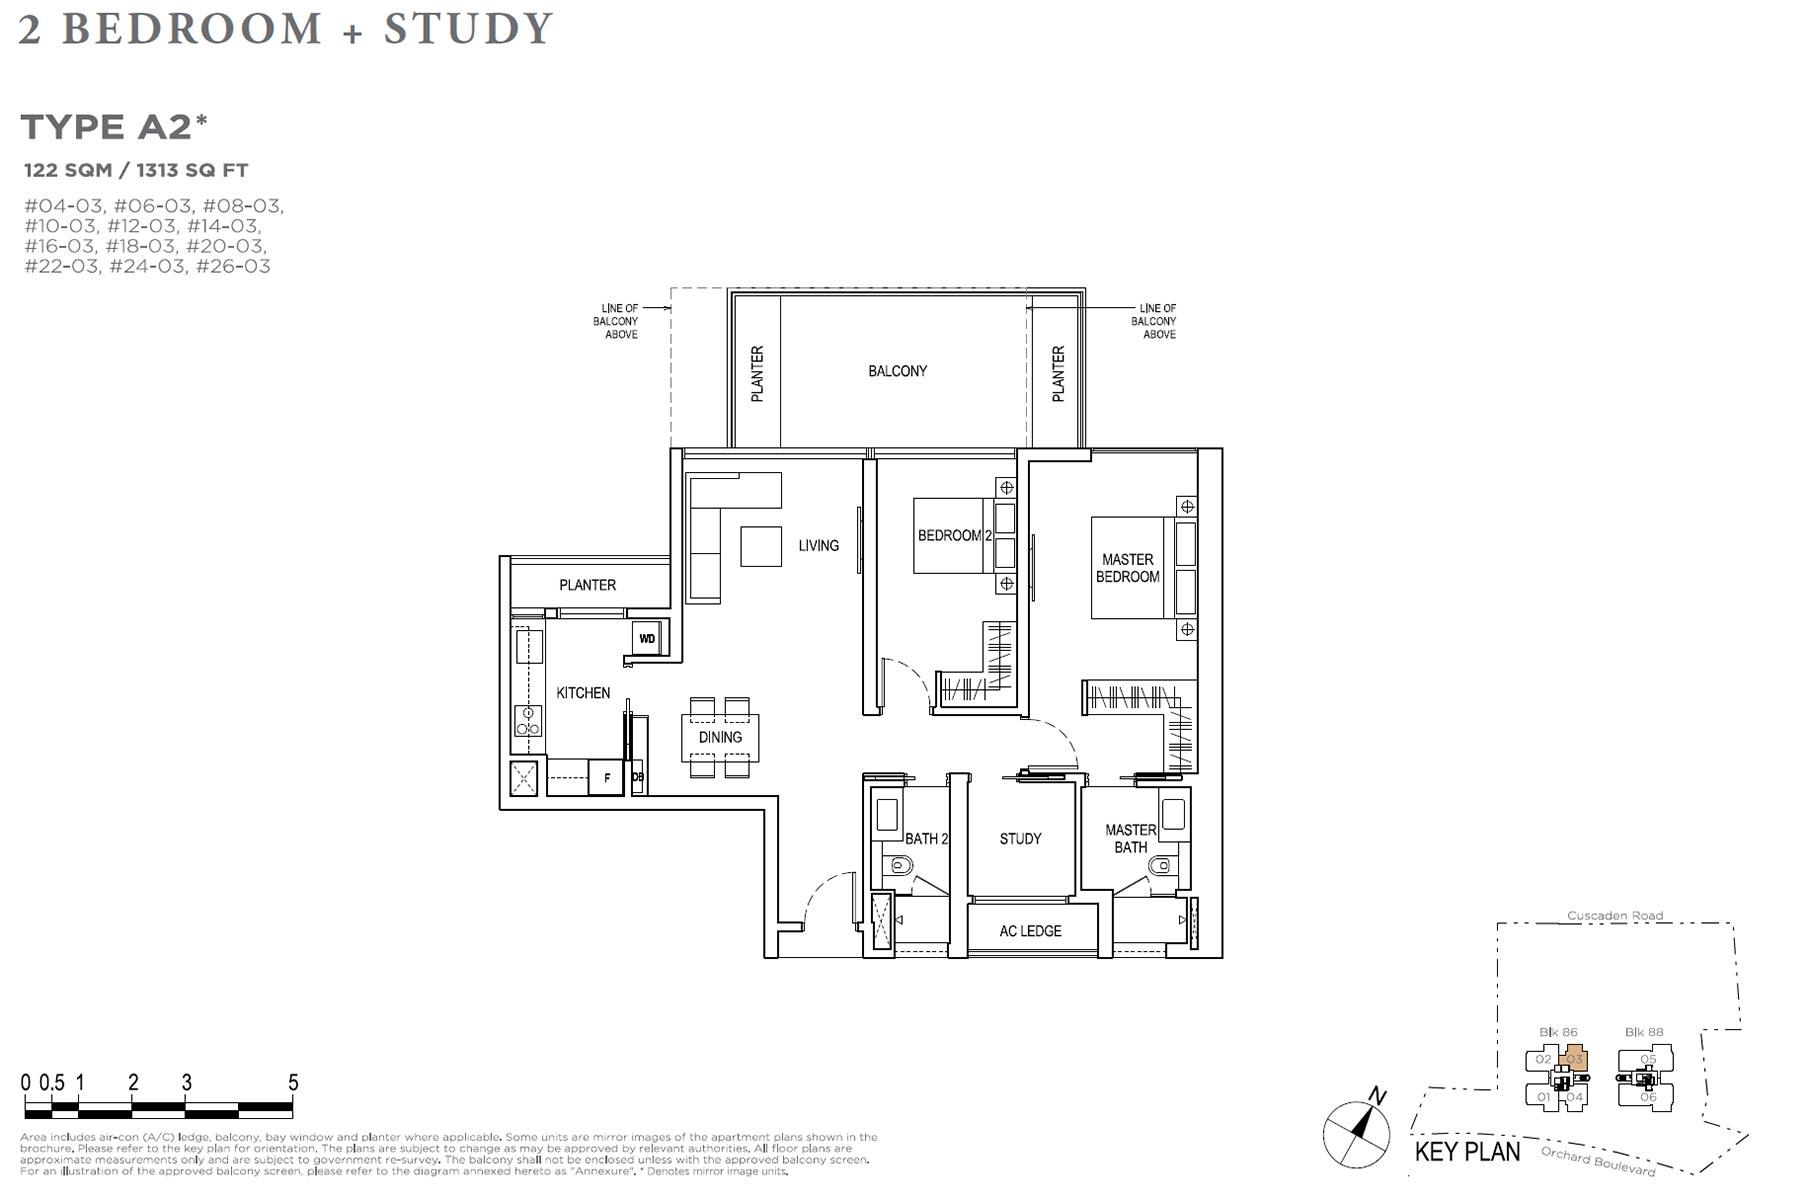 Boulevard 88 2 Bedroom + Study - Type A2